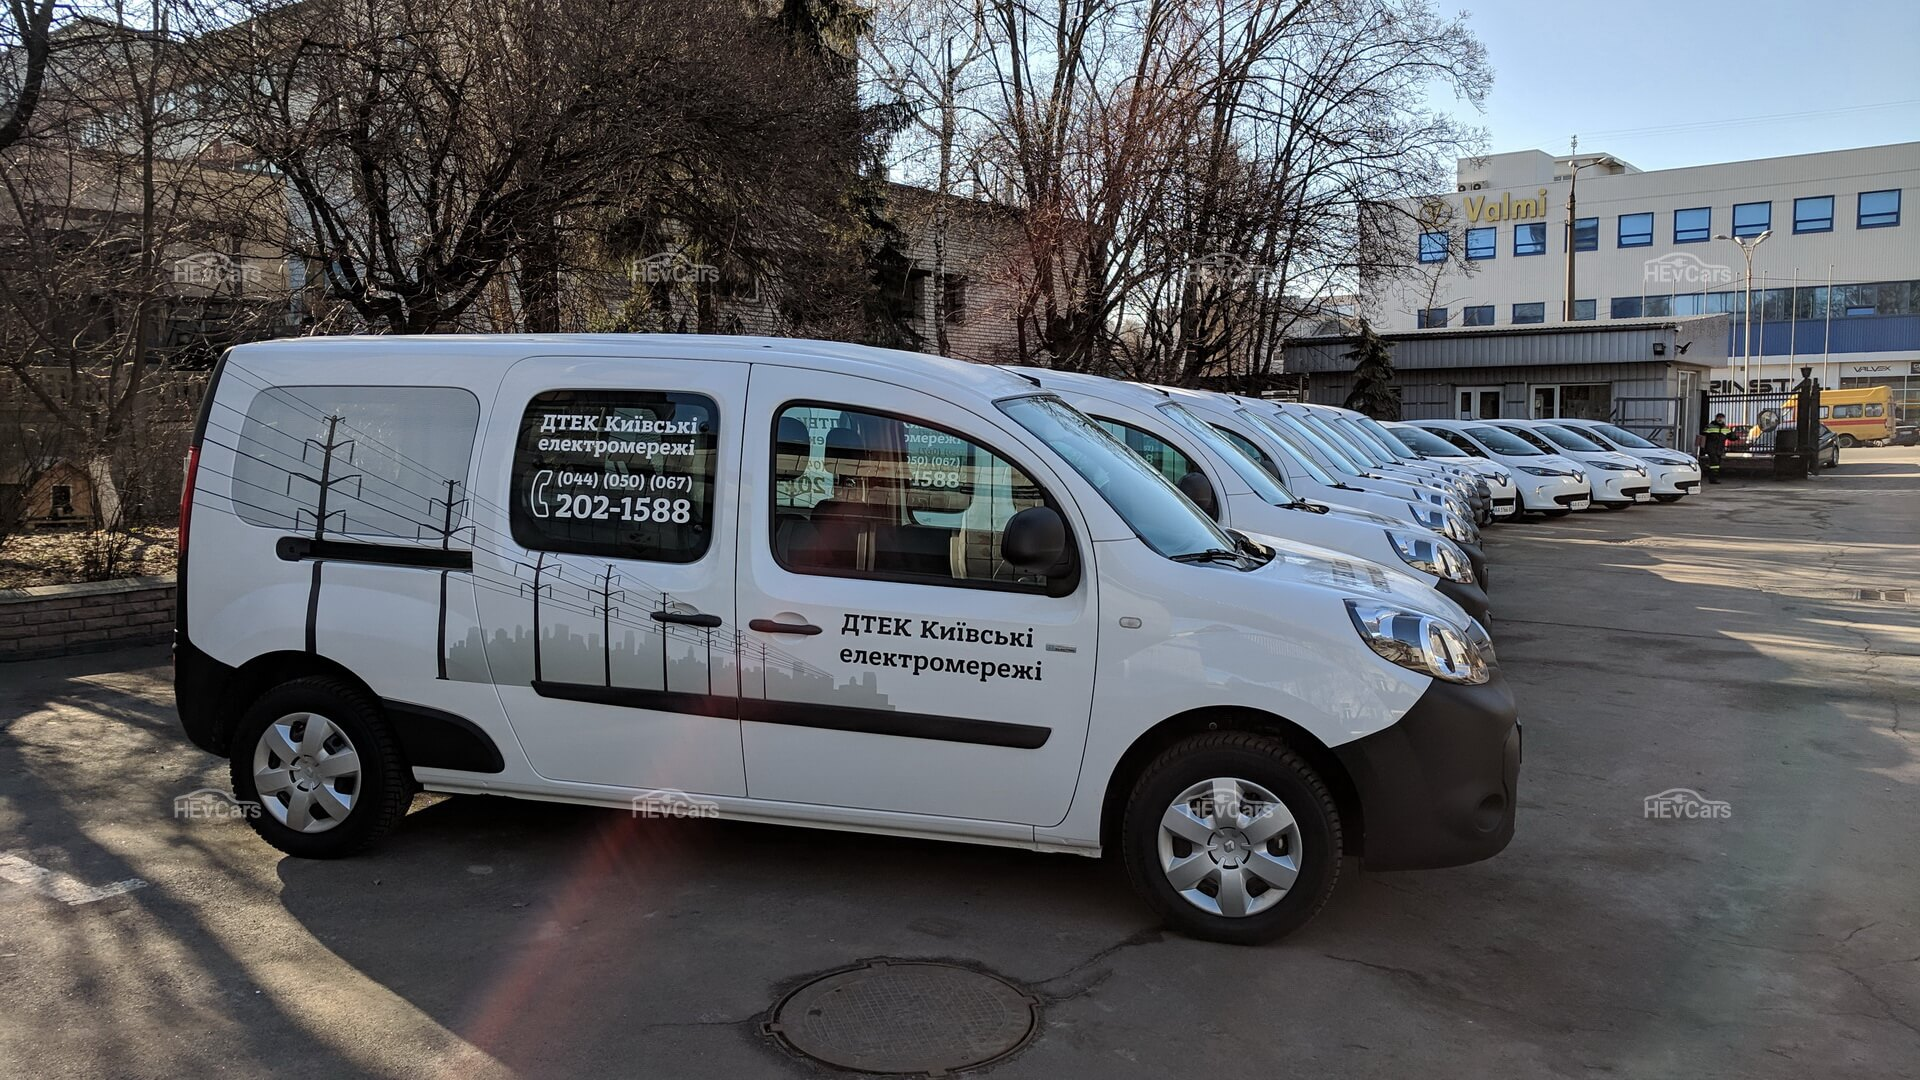 11электромобилей Renault ZOE иRenault Kangoo Z.E. пополнили парк ДТЭК